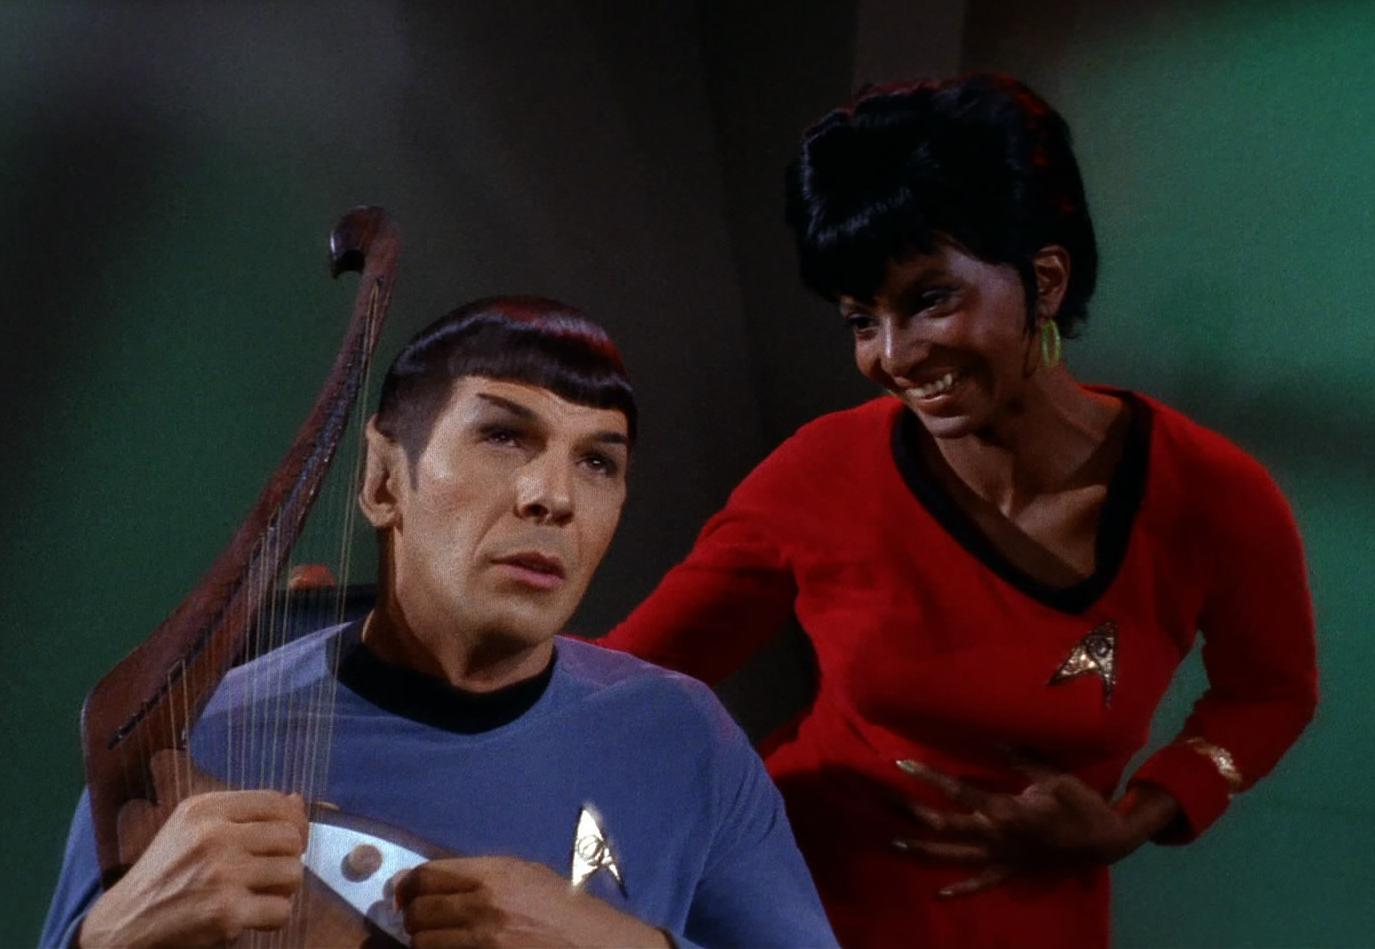 Spock_and_Uhura_make_music